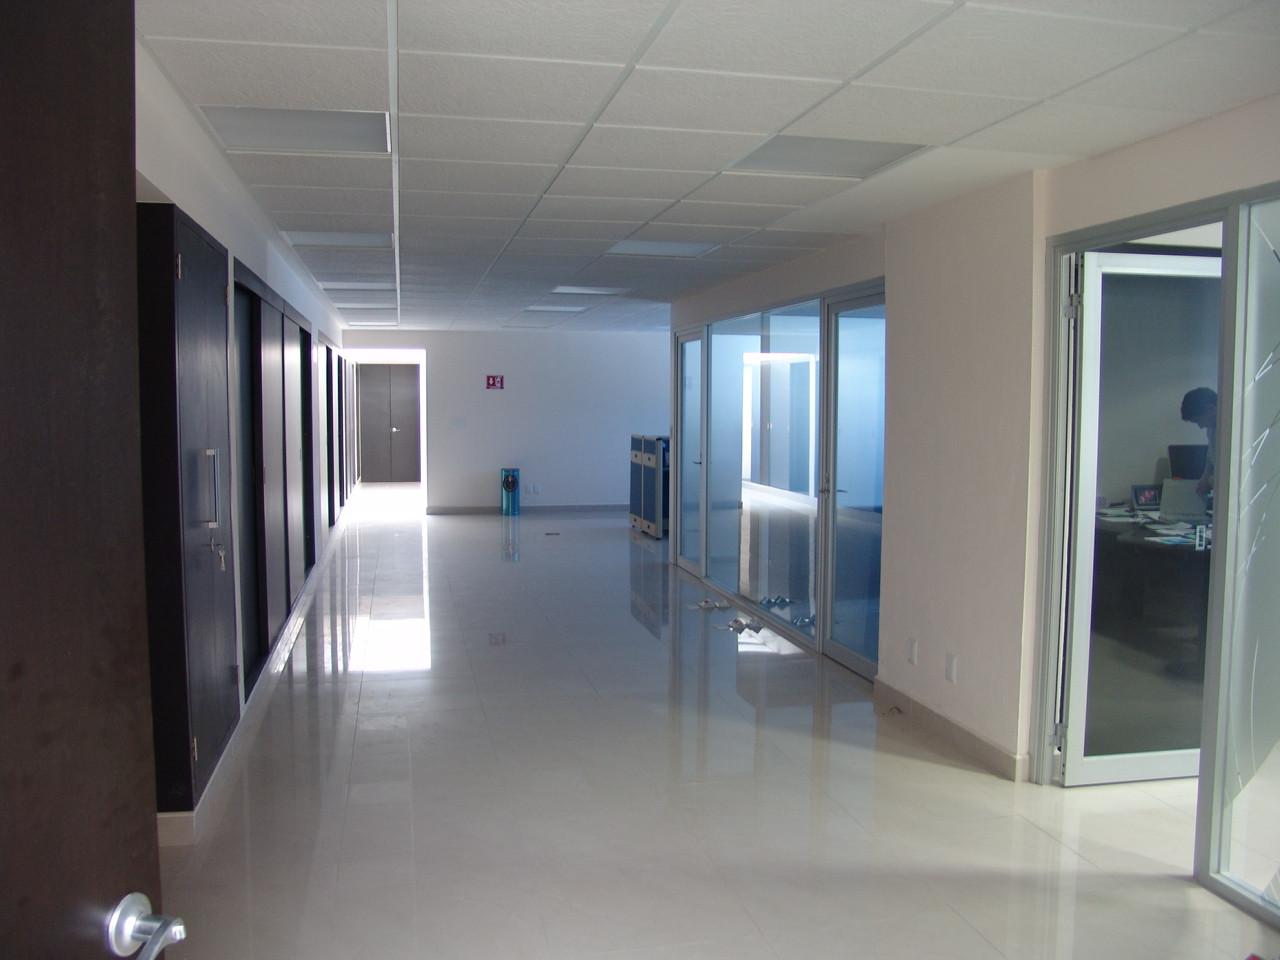 Fabrica Galenica Pharma